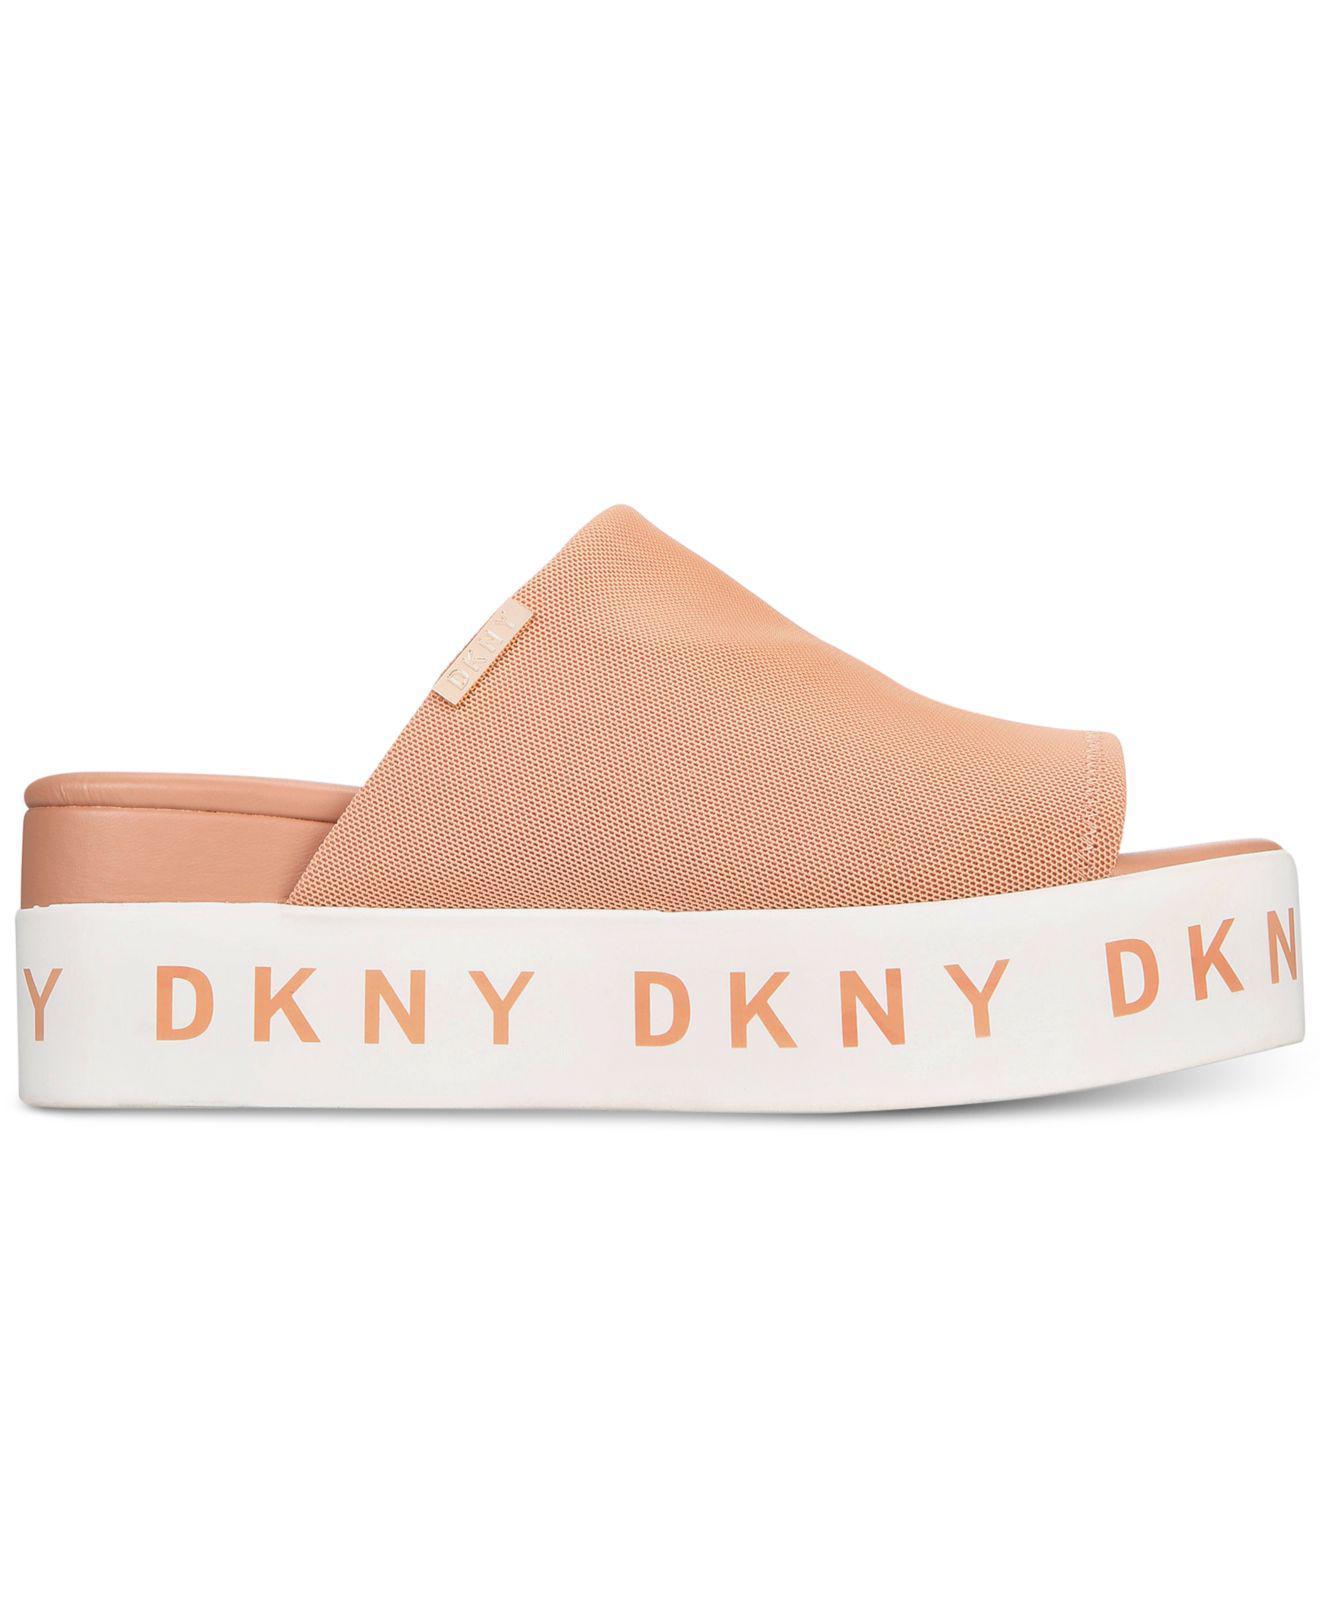 6668687eab5 DKNY Pink Carli Flatform Sandals, Created For Macy's